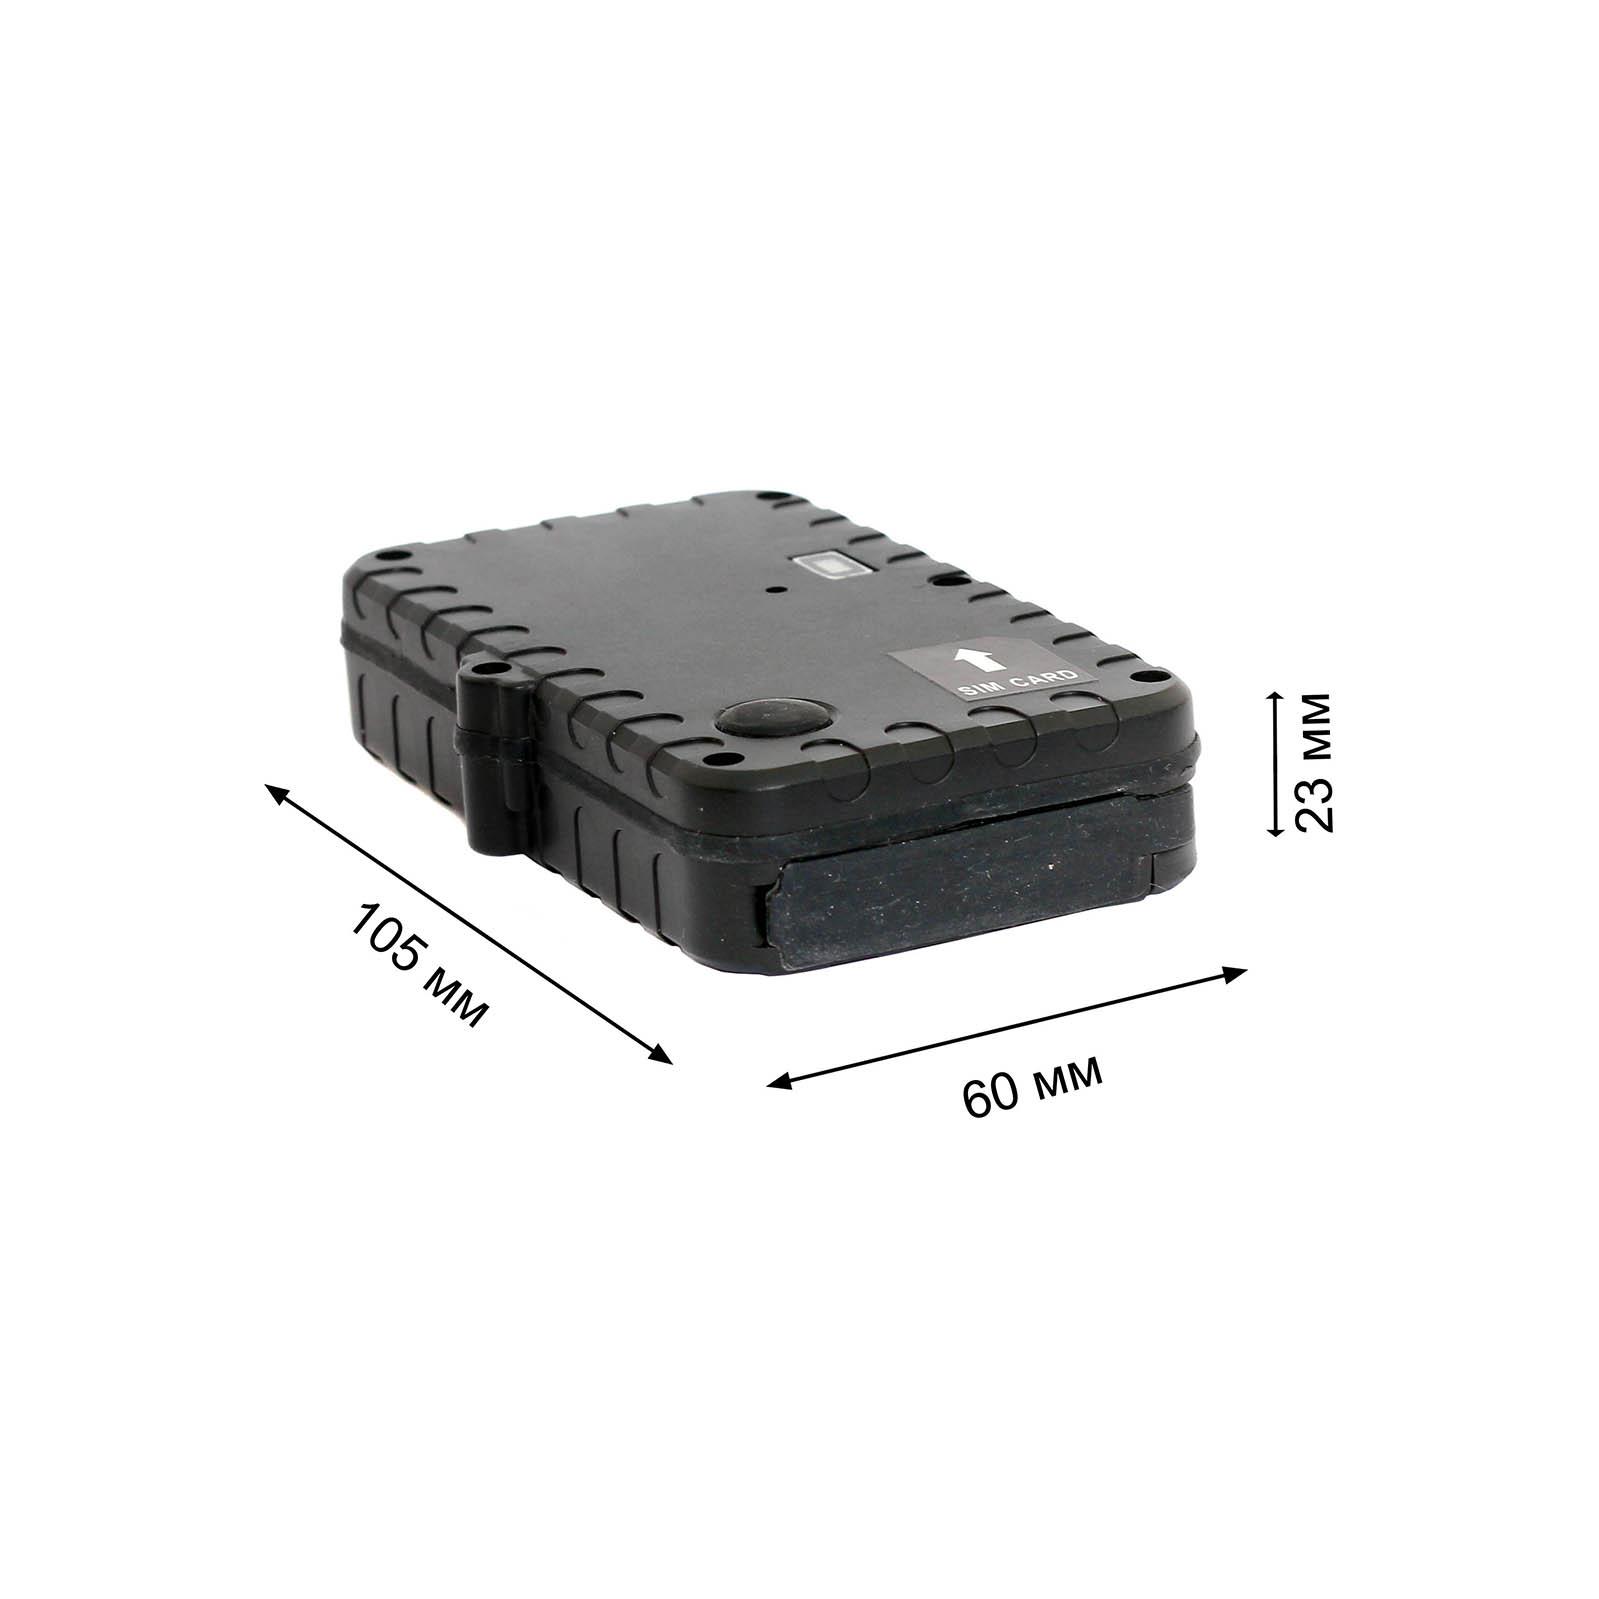 картинка GPS-glaz U25, 2500mah, автономный GPS маяк на магните